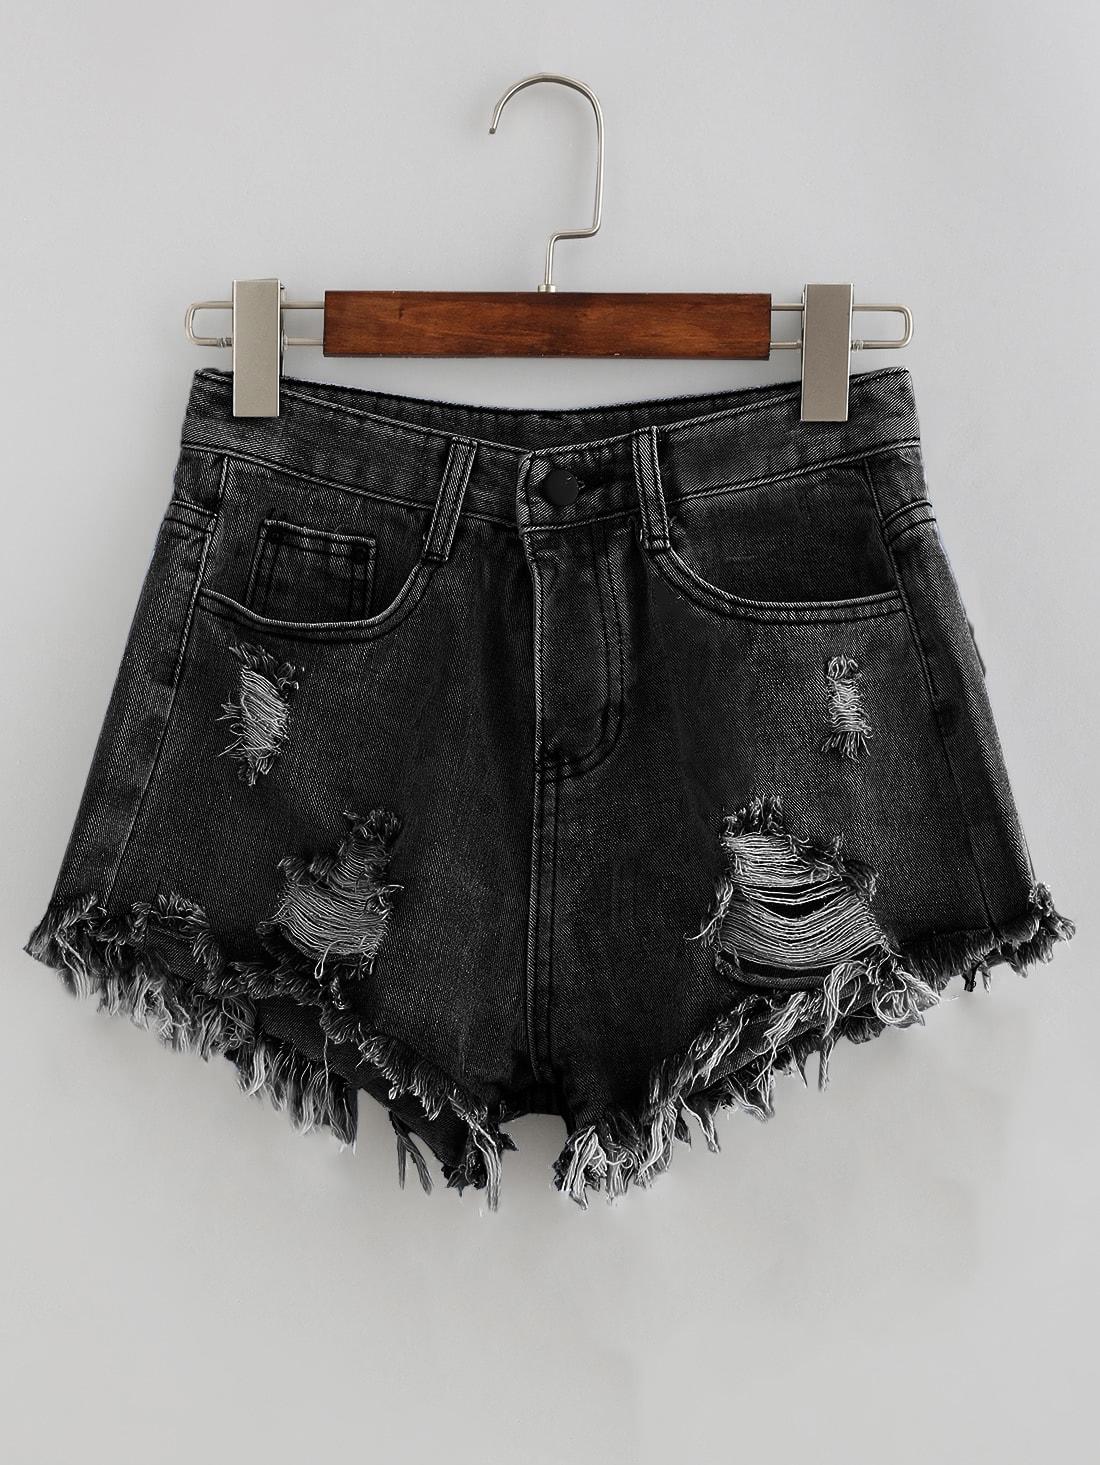 Bleach Wash Distressed Denim Shorts shorts170605450